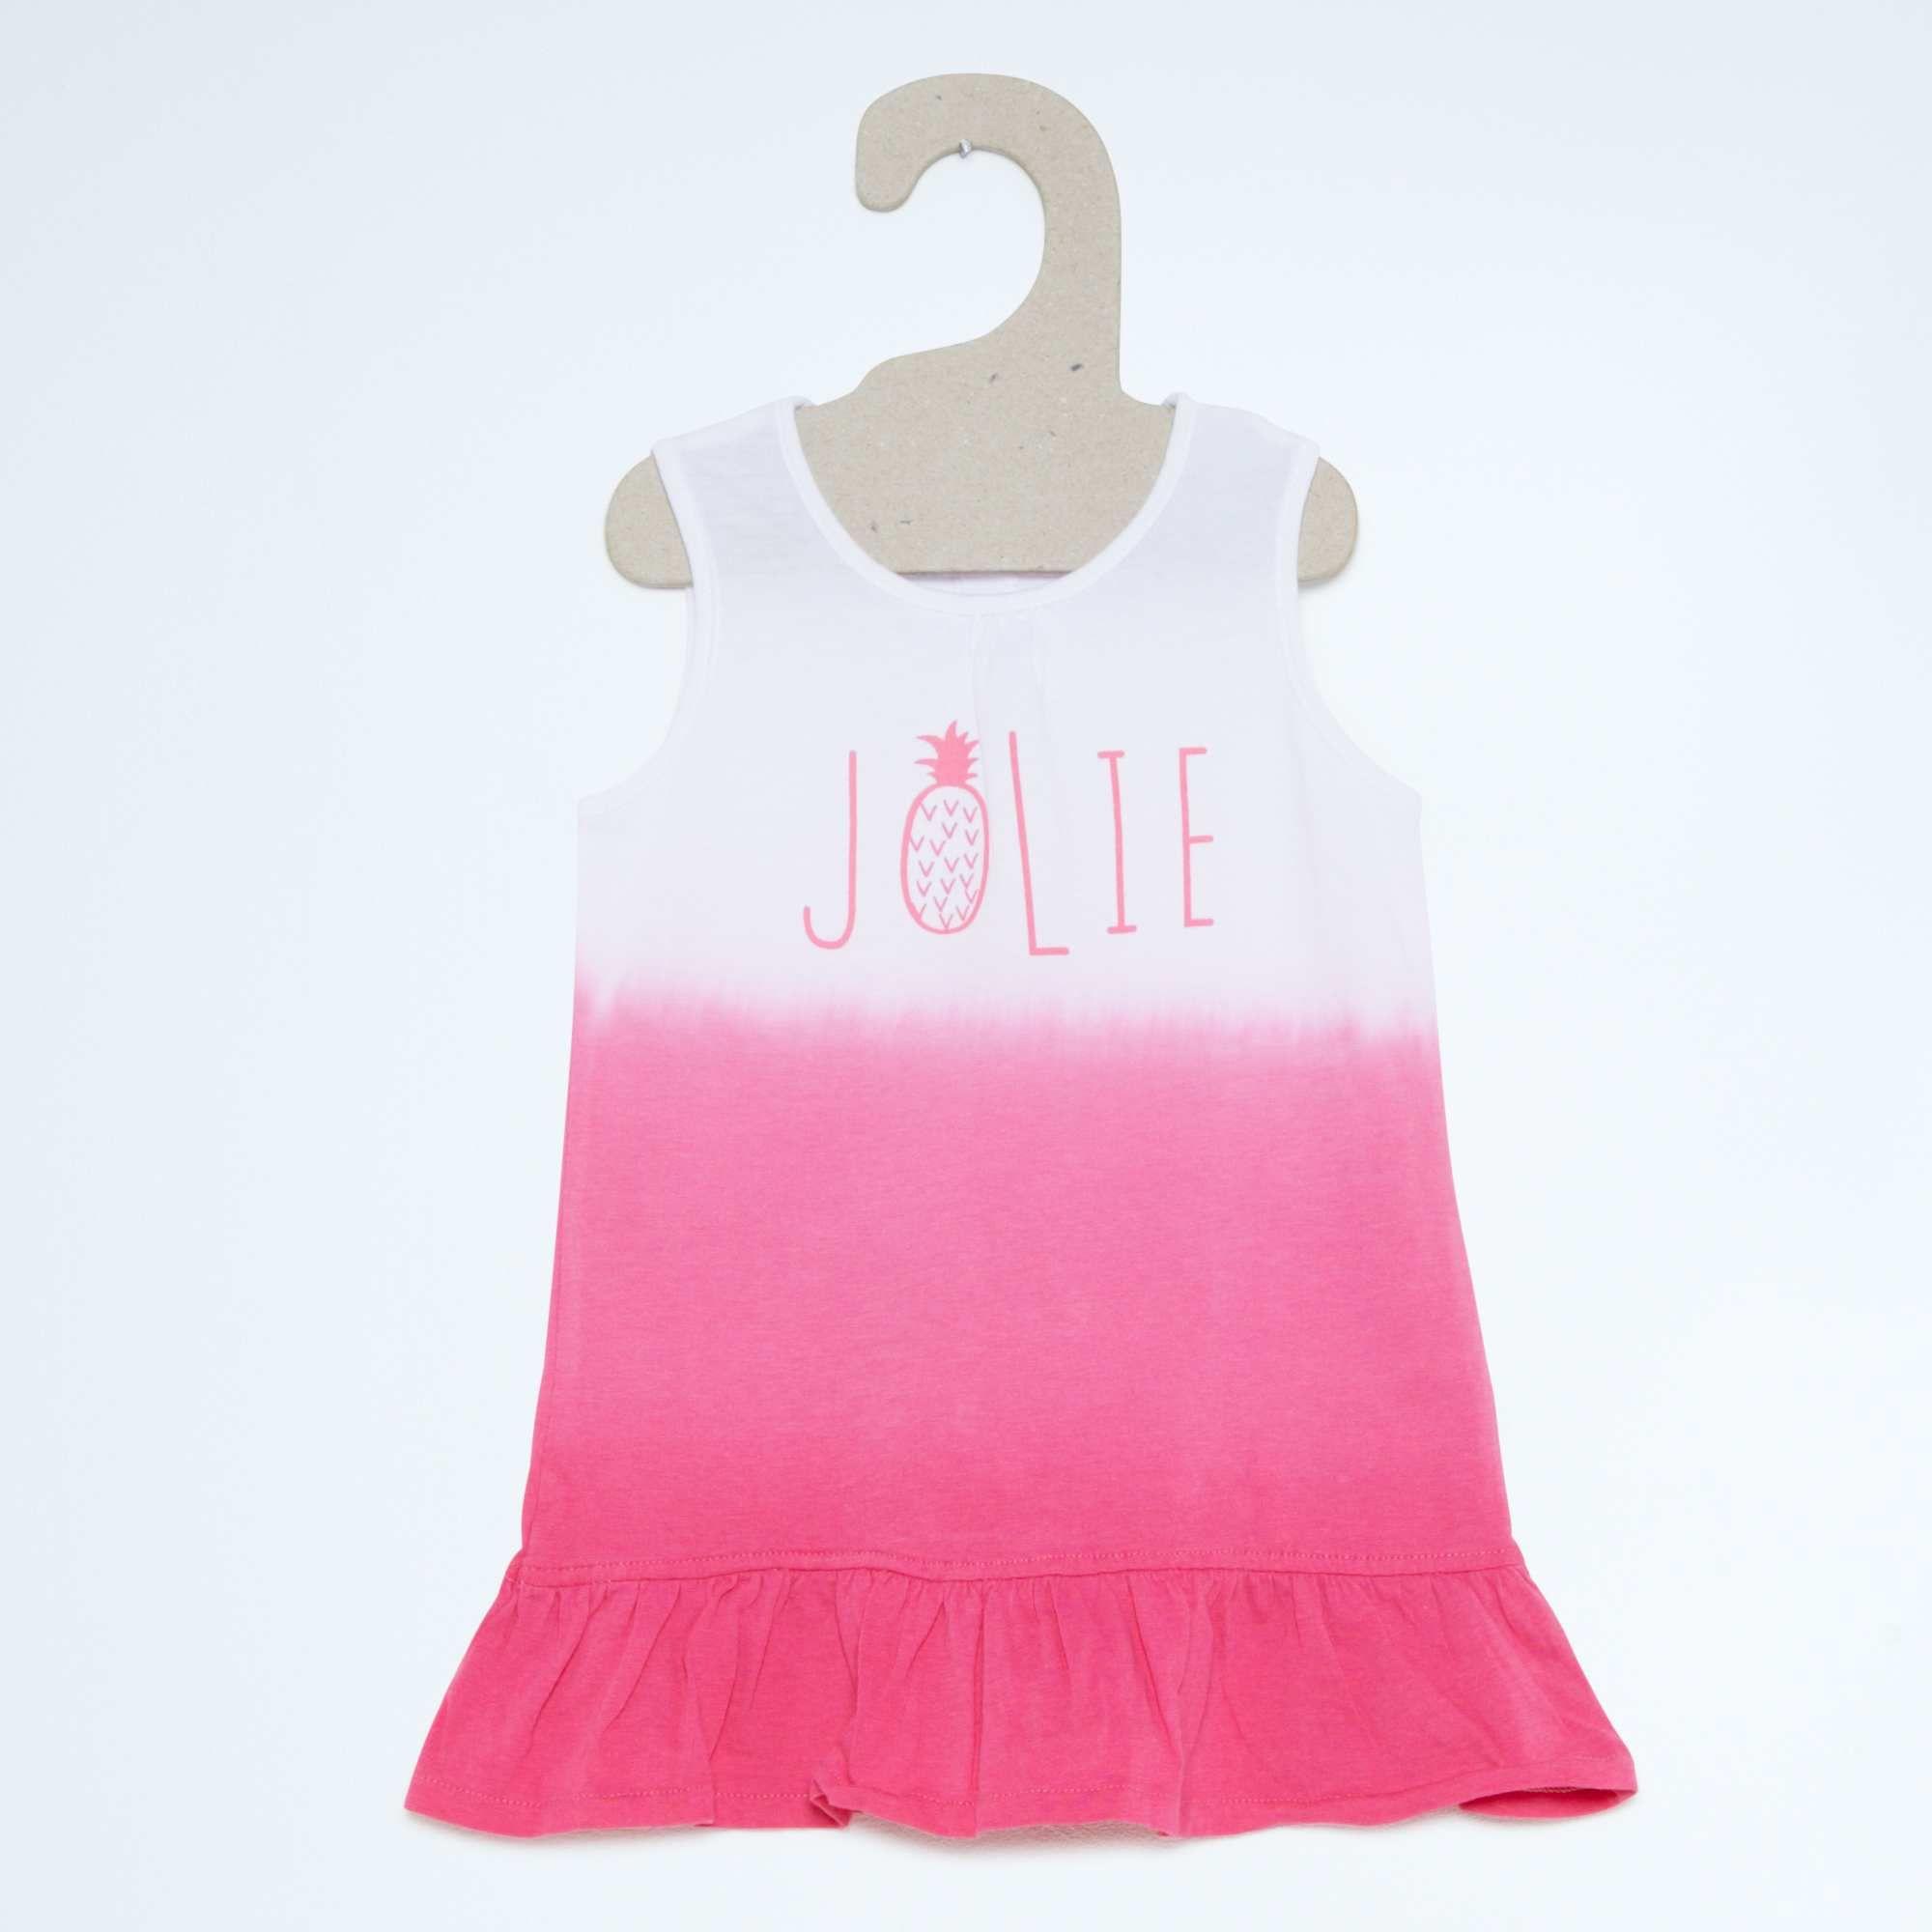 Robe volantée en jersey Bébé fille - Kiabi - 4,00€   Vêtement enfant ...